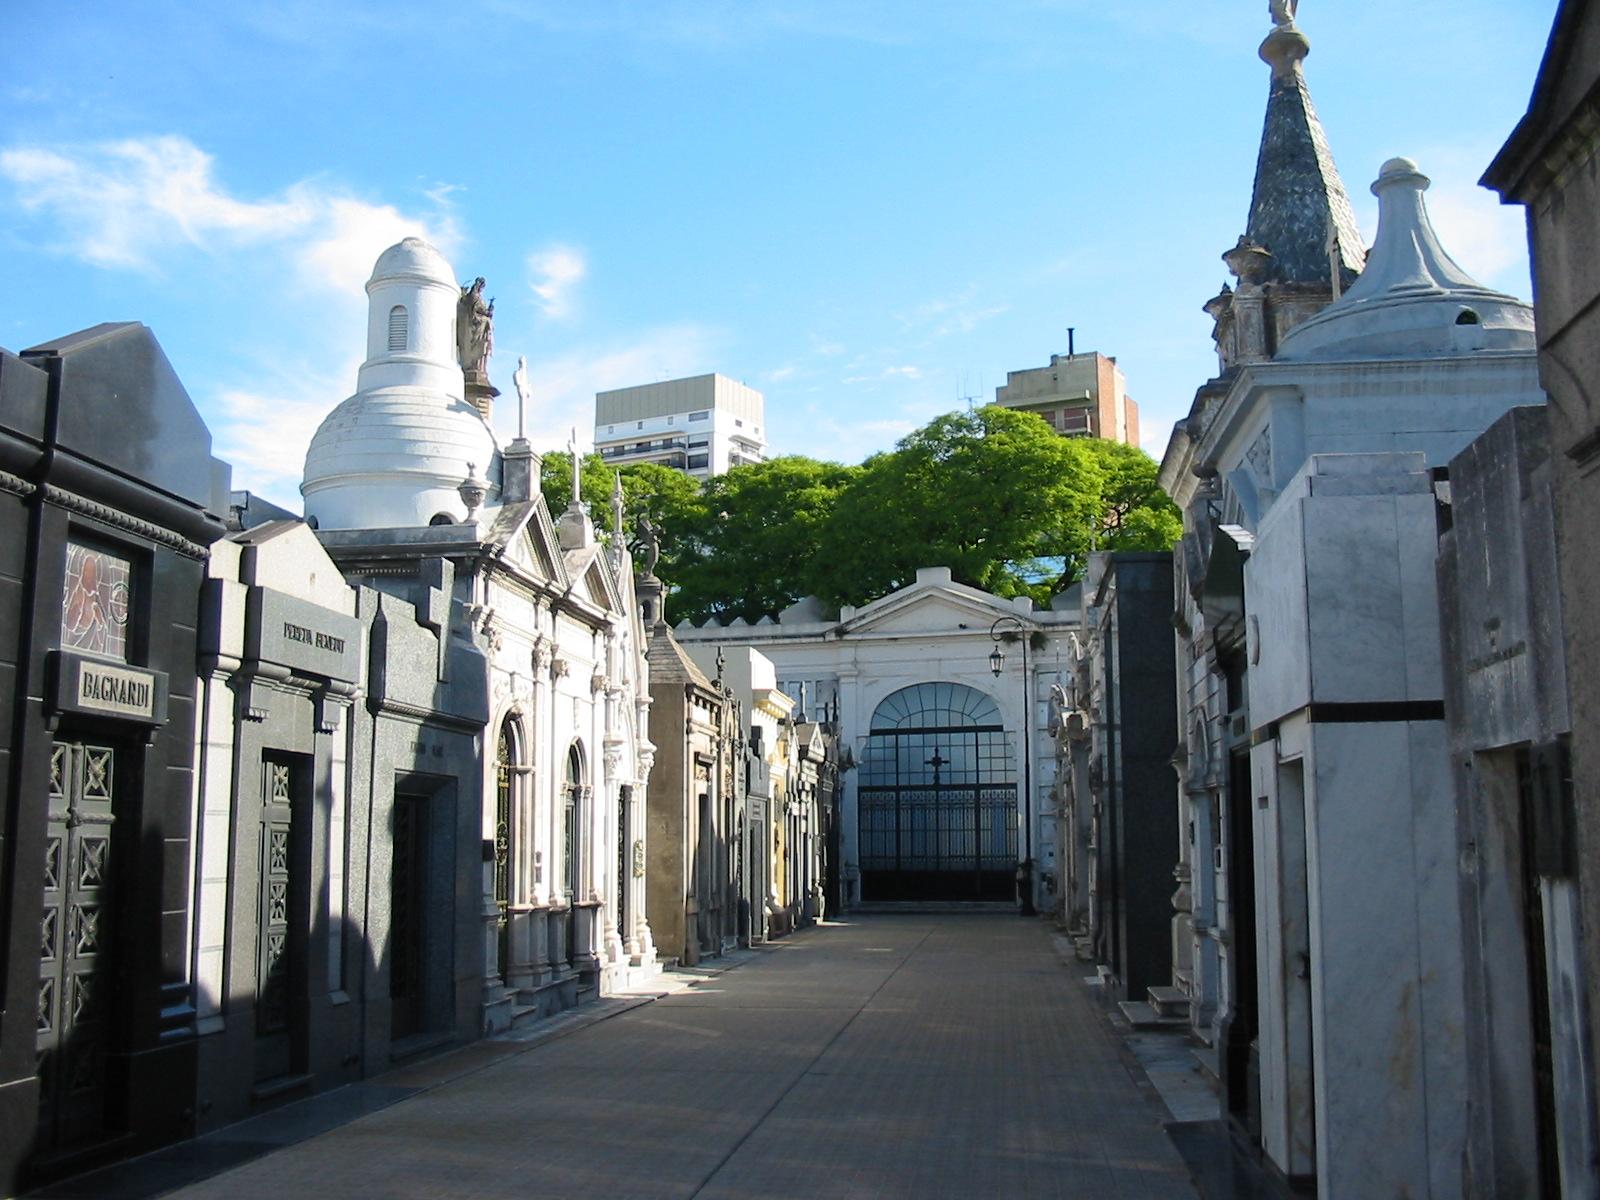 Argentina Cementerio_de_la_Recoleta_-_Buenos_Aires_-_Argentina